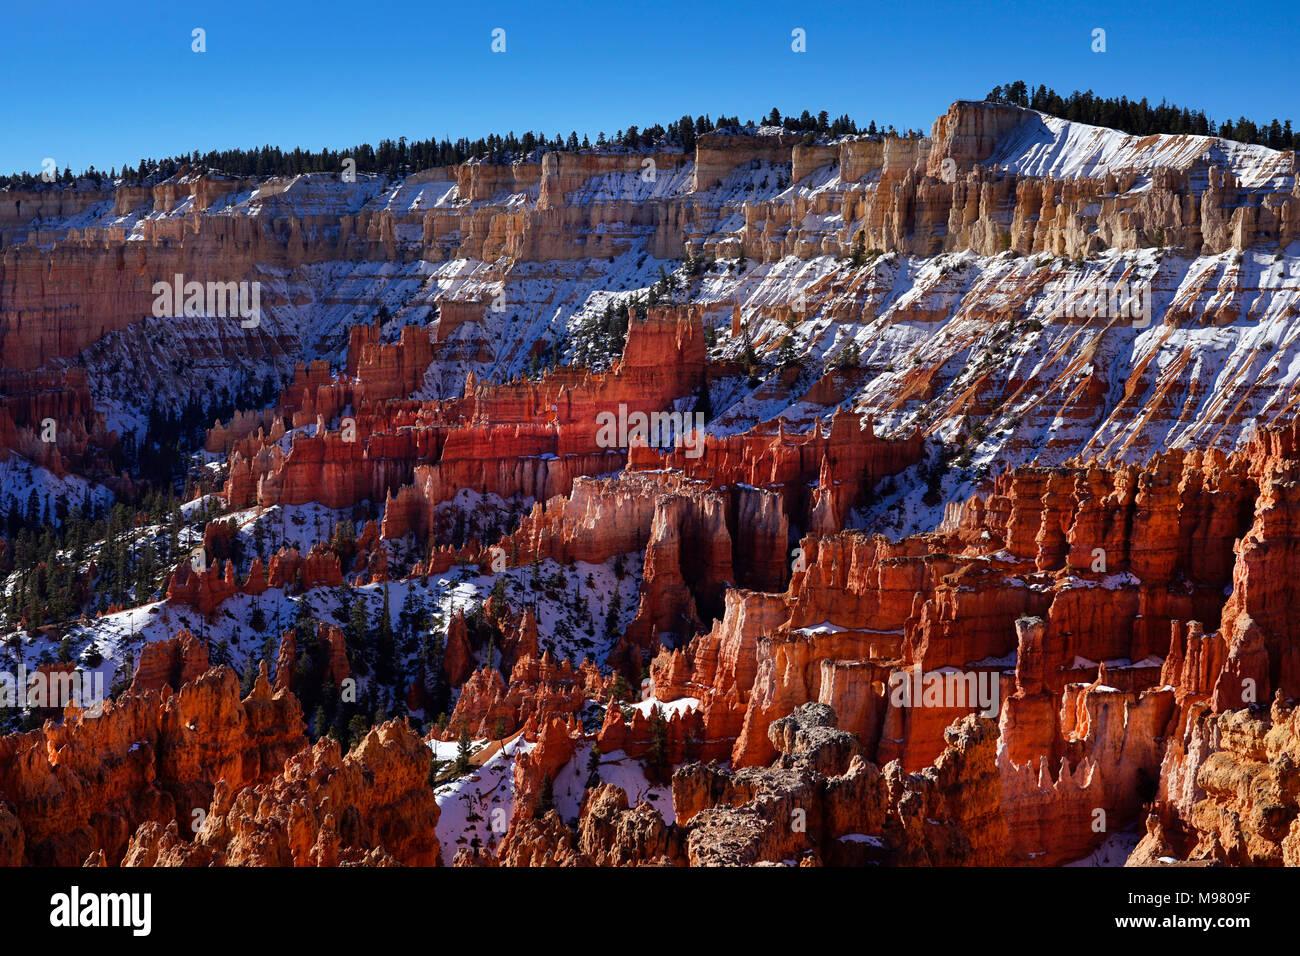 Bryce Canyon National Park,Utah,America,USA - Stock Image